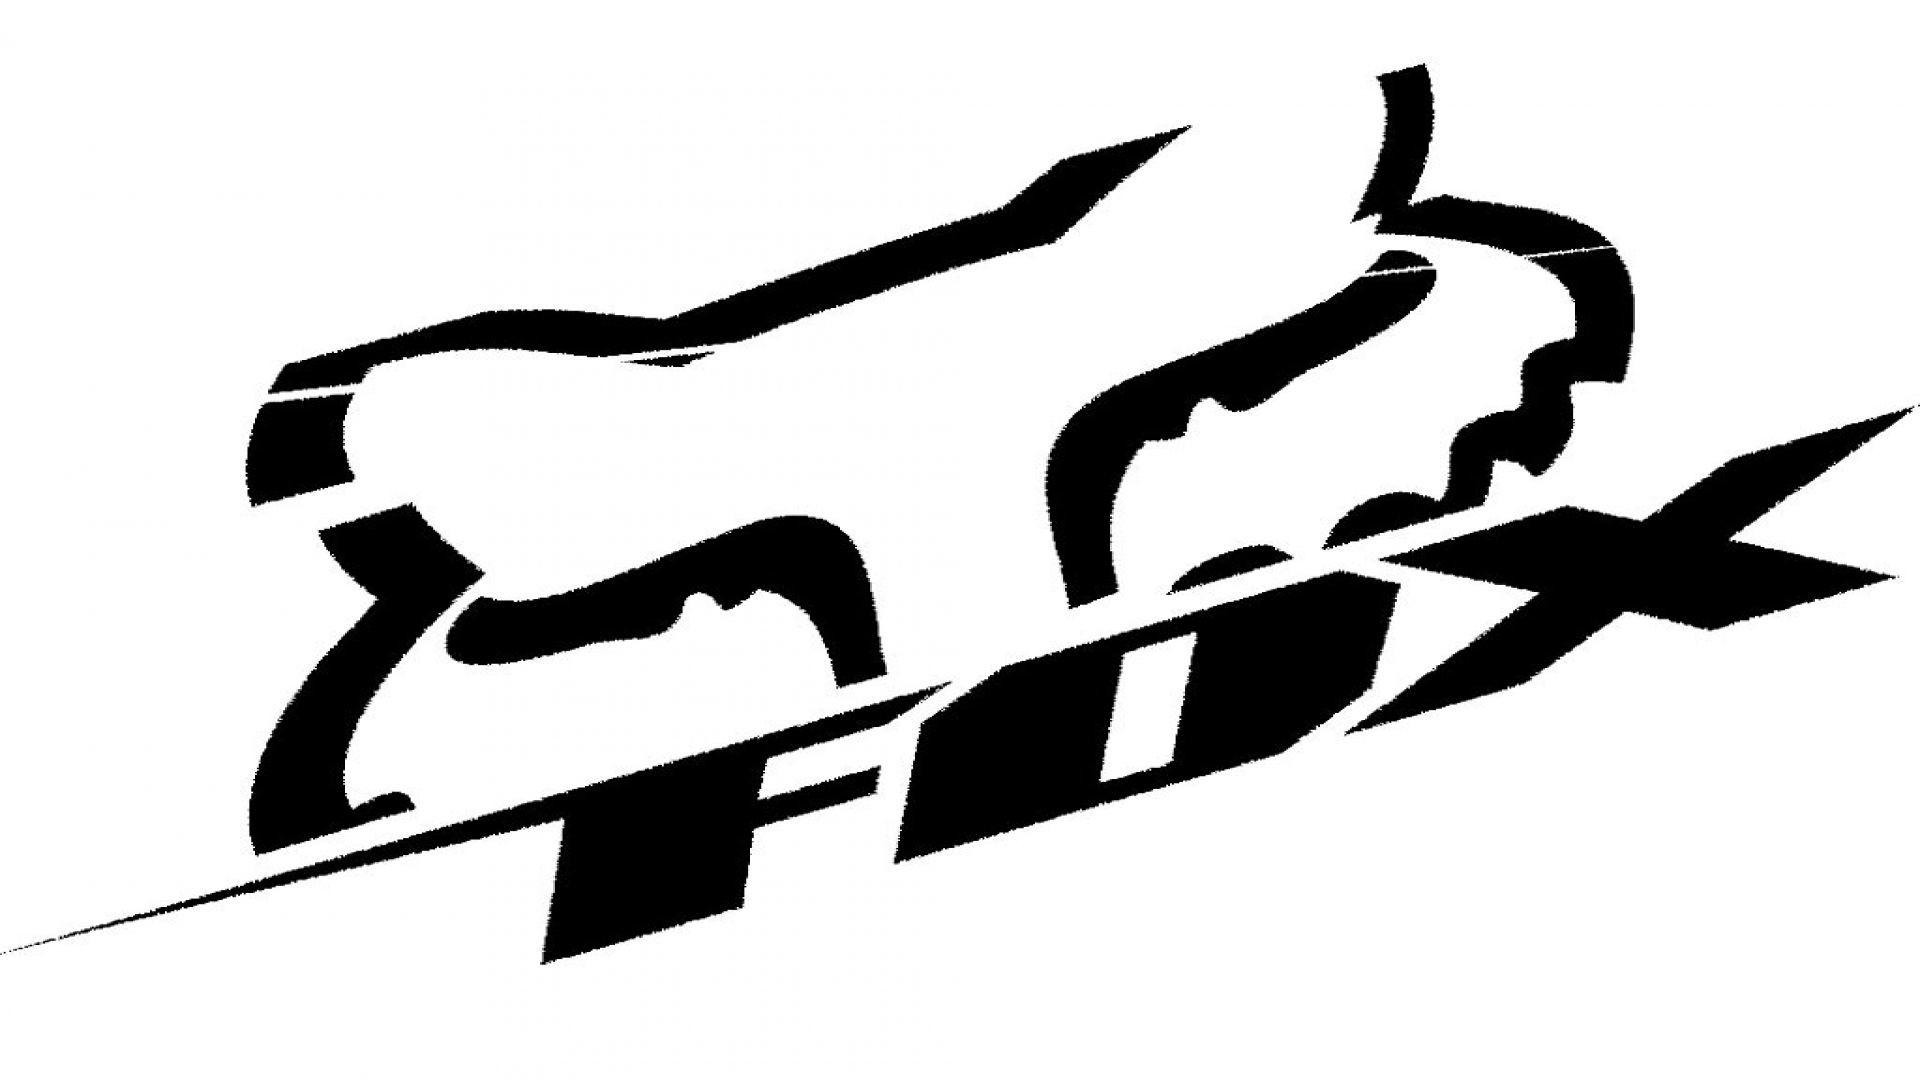 Fox racing logo wallpaper for iphone – photo#26